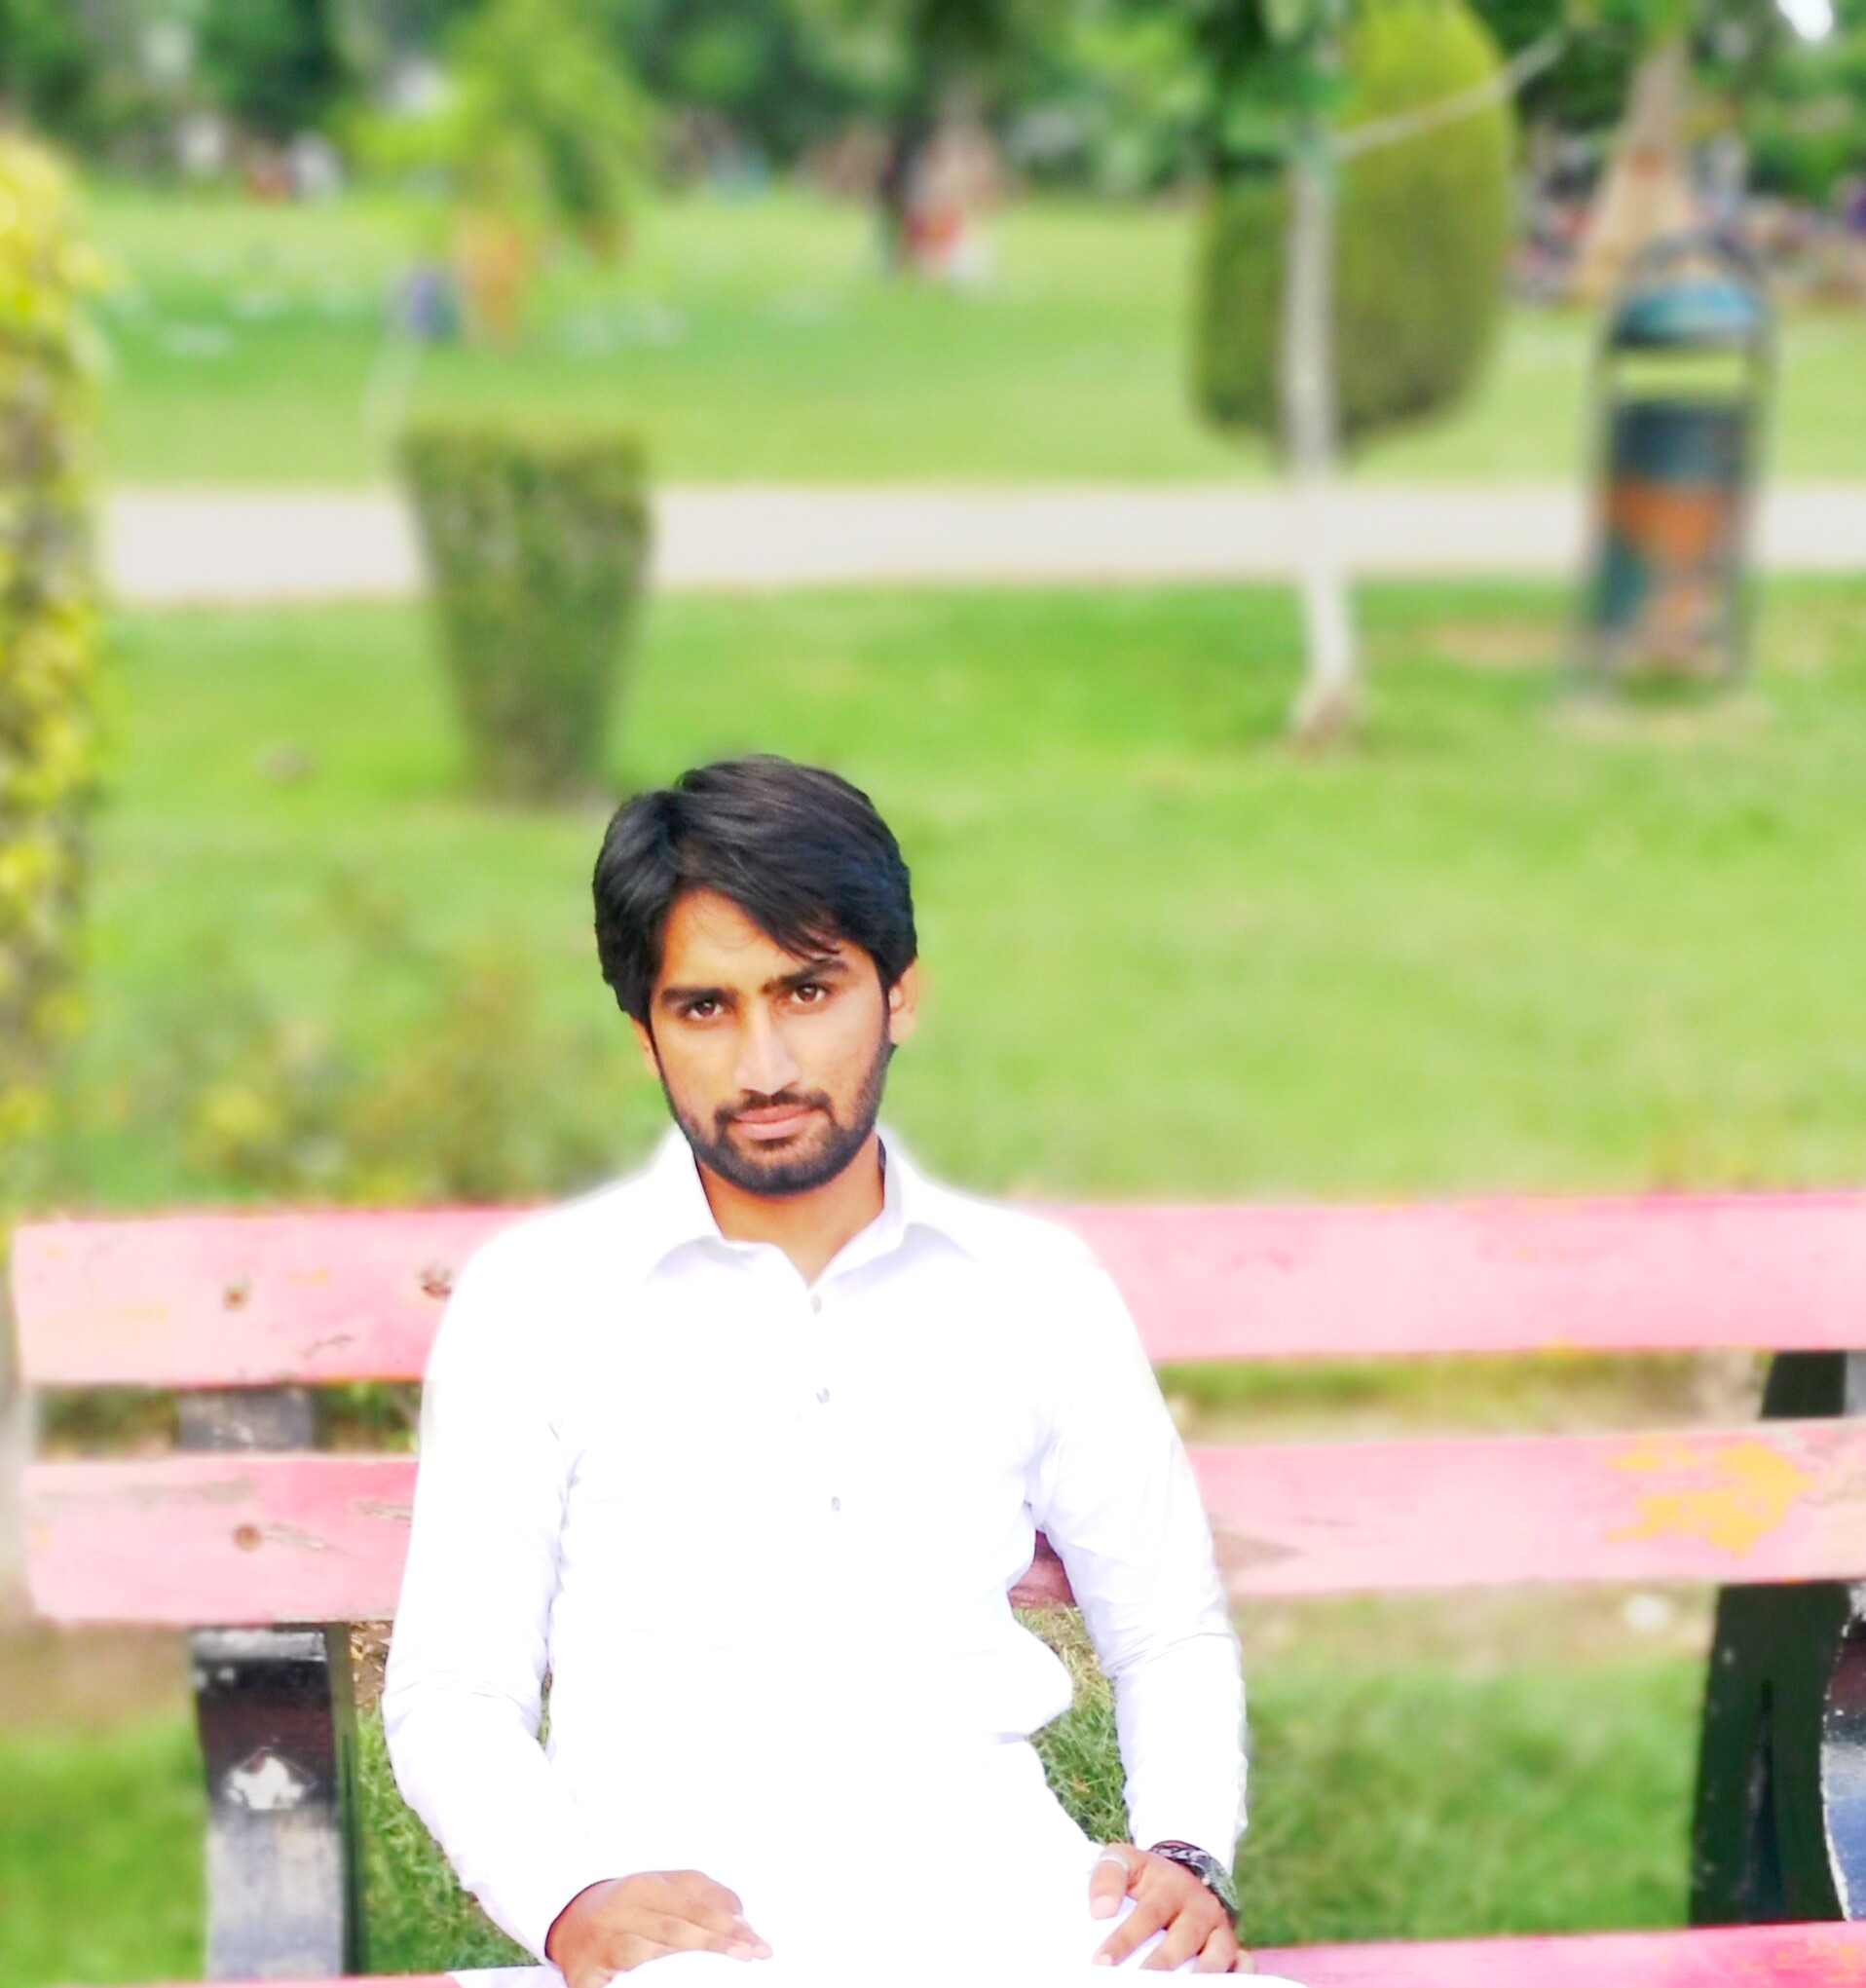 Muhammad Mubeen Sardar Landing Pages, Website Design, Data Entry, JQuery / Prototype